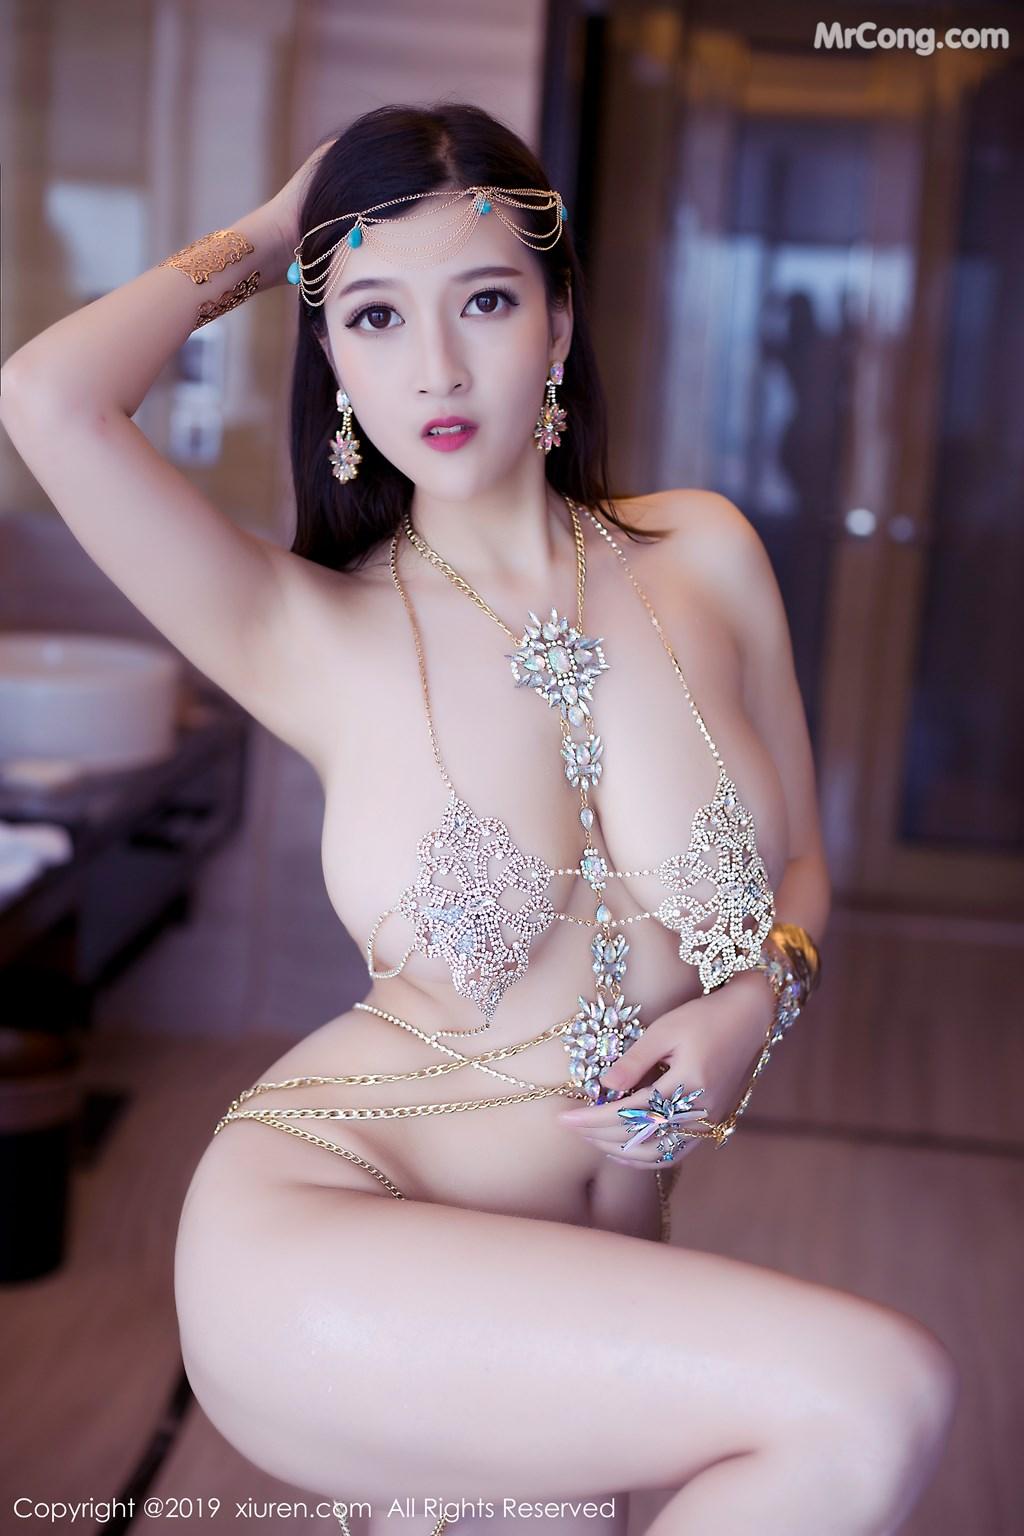 Image XIUREN-No.1409-Alina-MrCong.com-006 in post XIUREN No.1409: 双笙Alina (46 ảnh)